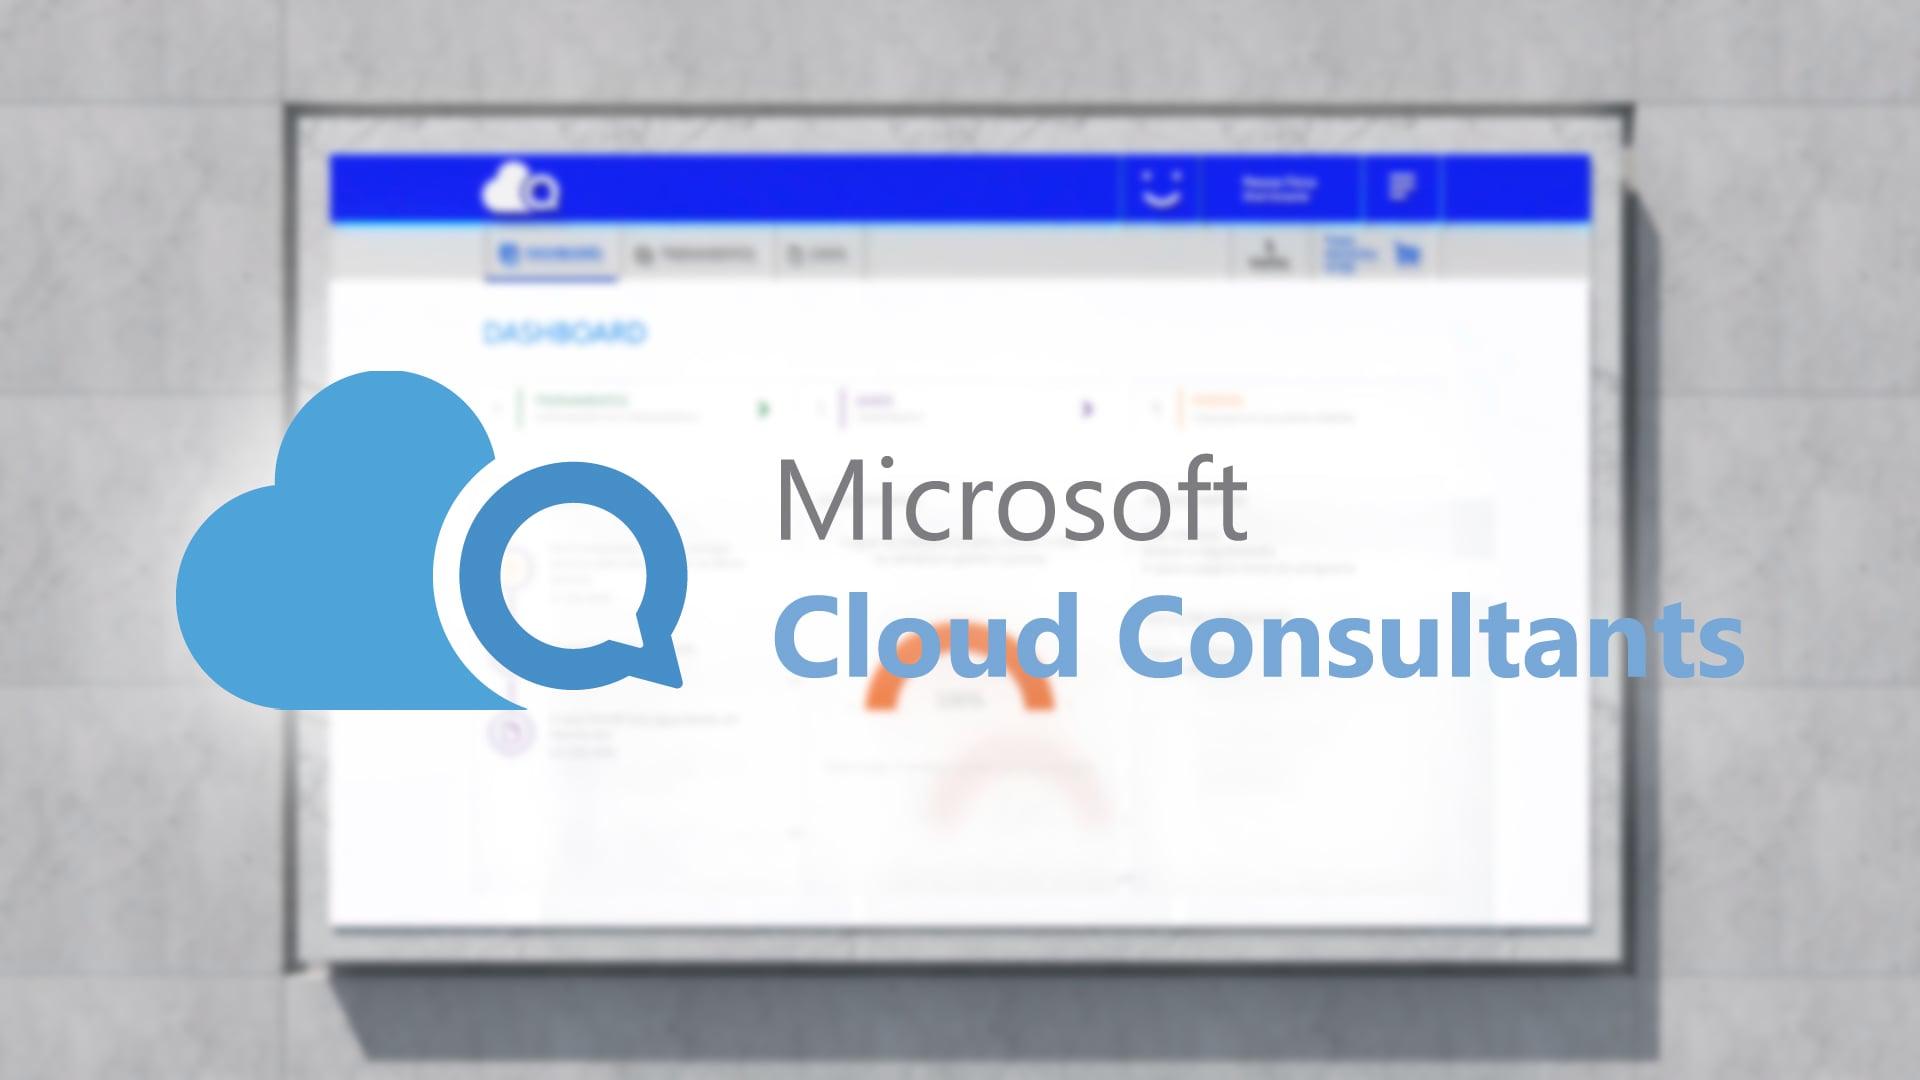 MICROSOFT - Cloud Consultants Program